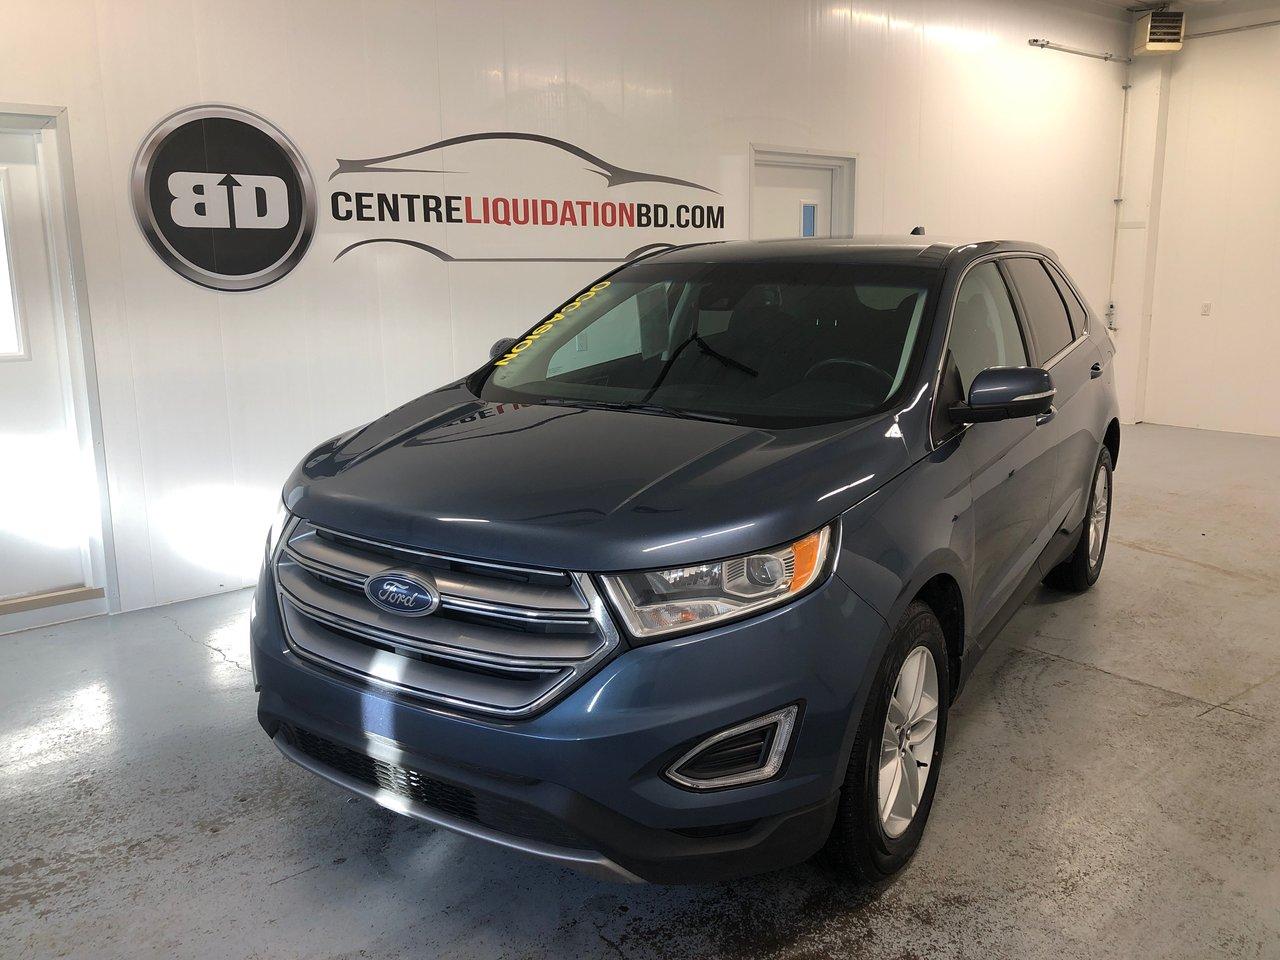 Ford Edge 2018 SEL + AWD + 2.0 L ECOBOOST